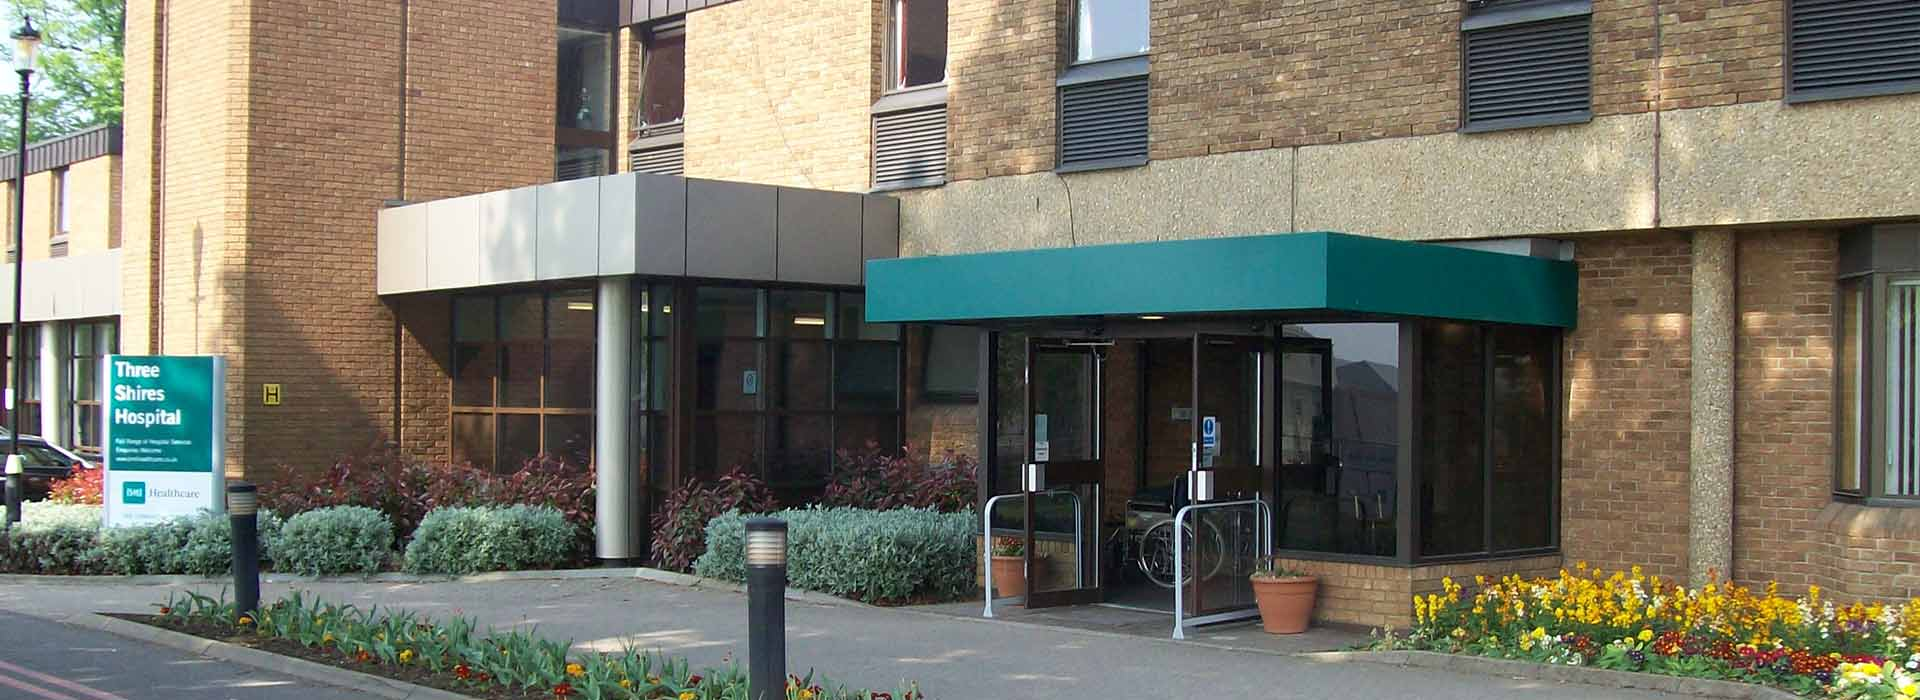 BMI Three Shires Hospital